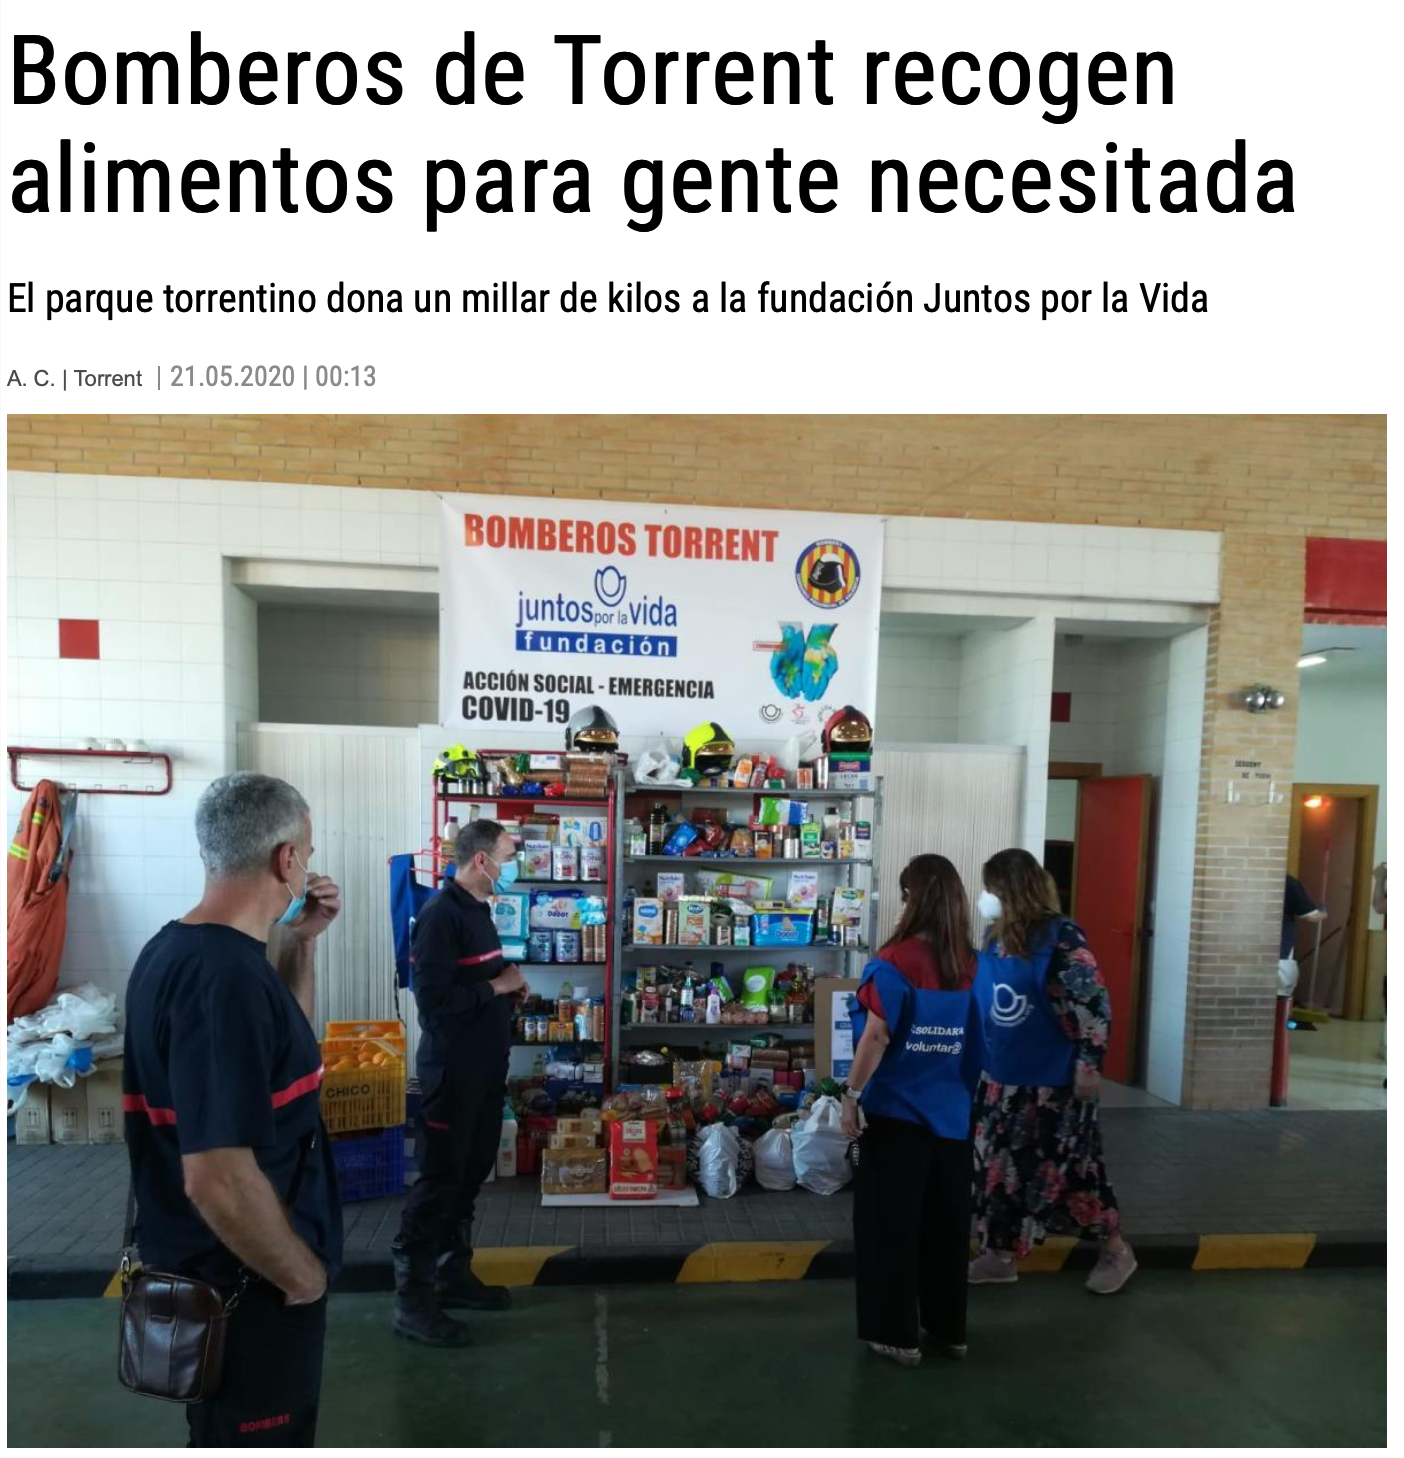 Bomberos de Torrent recogen alimentos. Levante 21 mayo